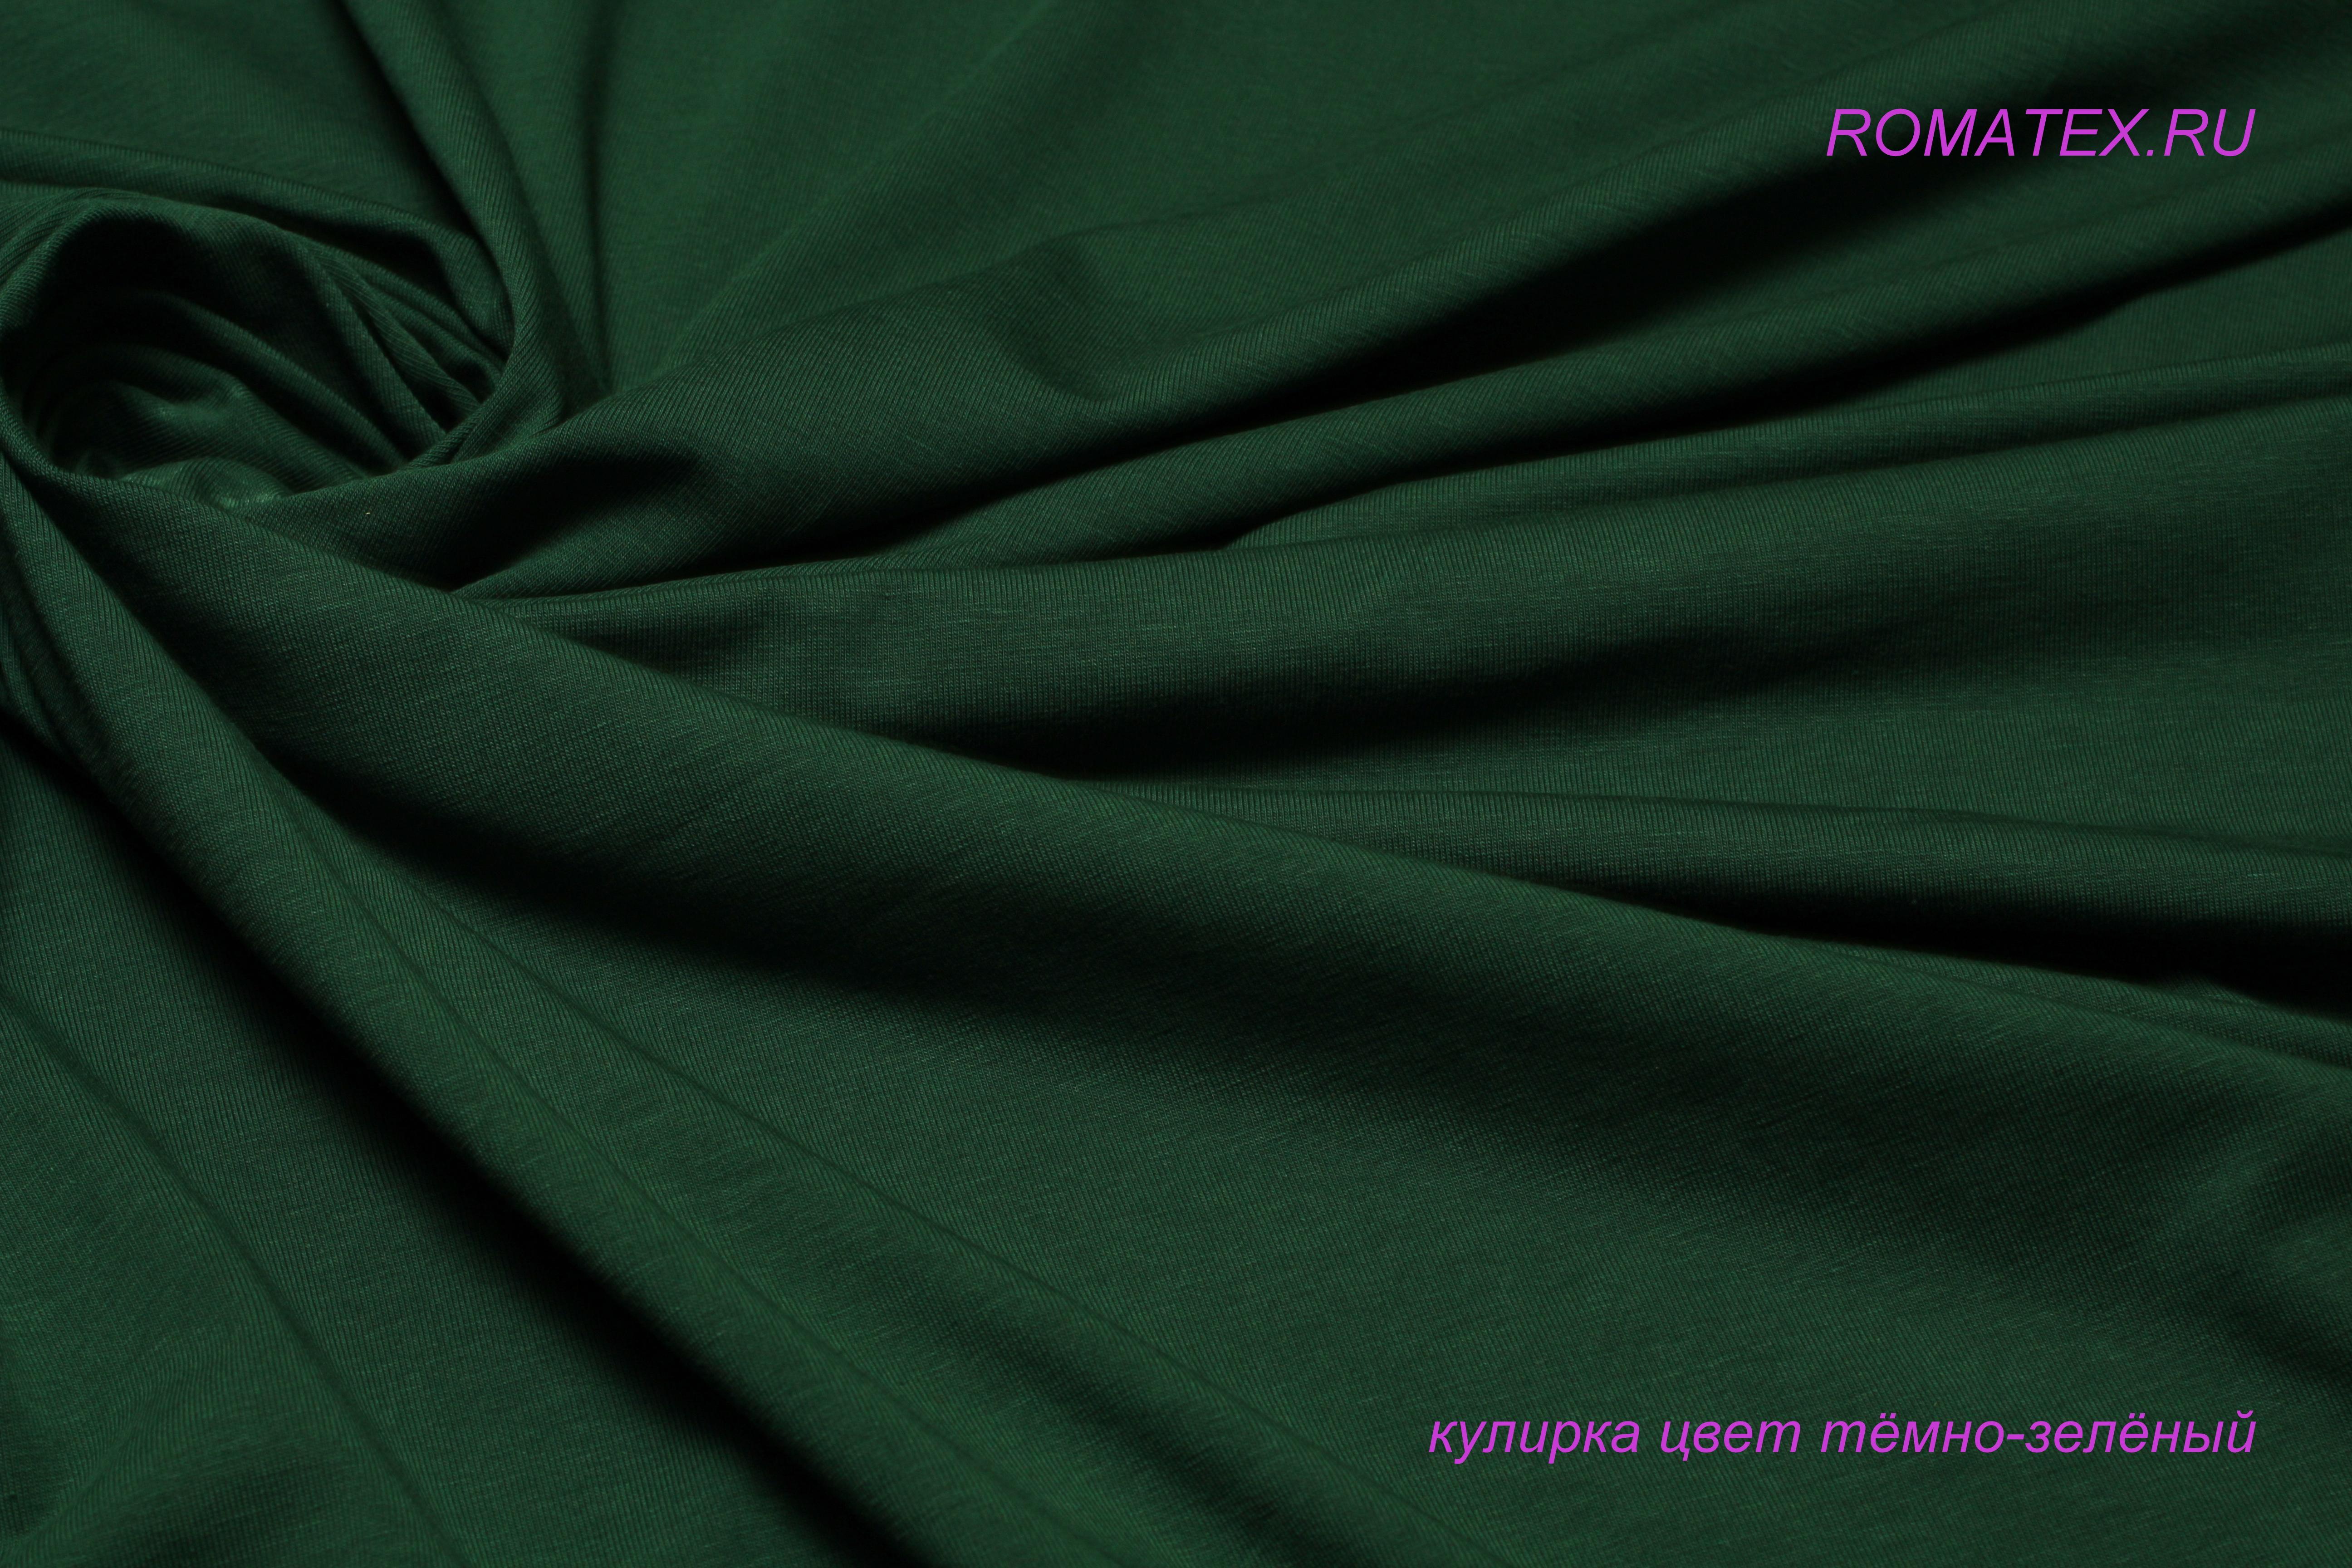 Кулирка Лайкра Пенье цвет тёмно-зелёный